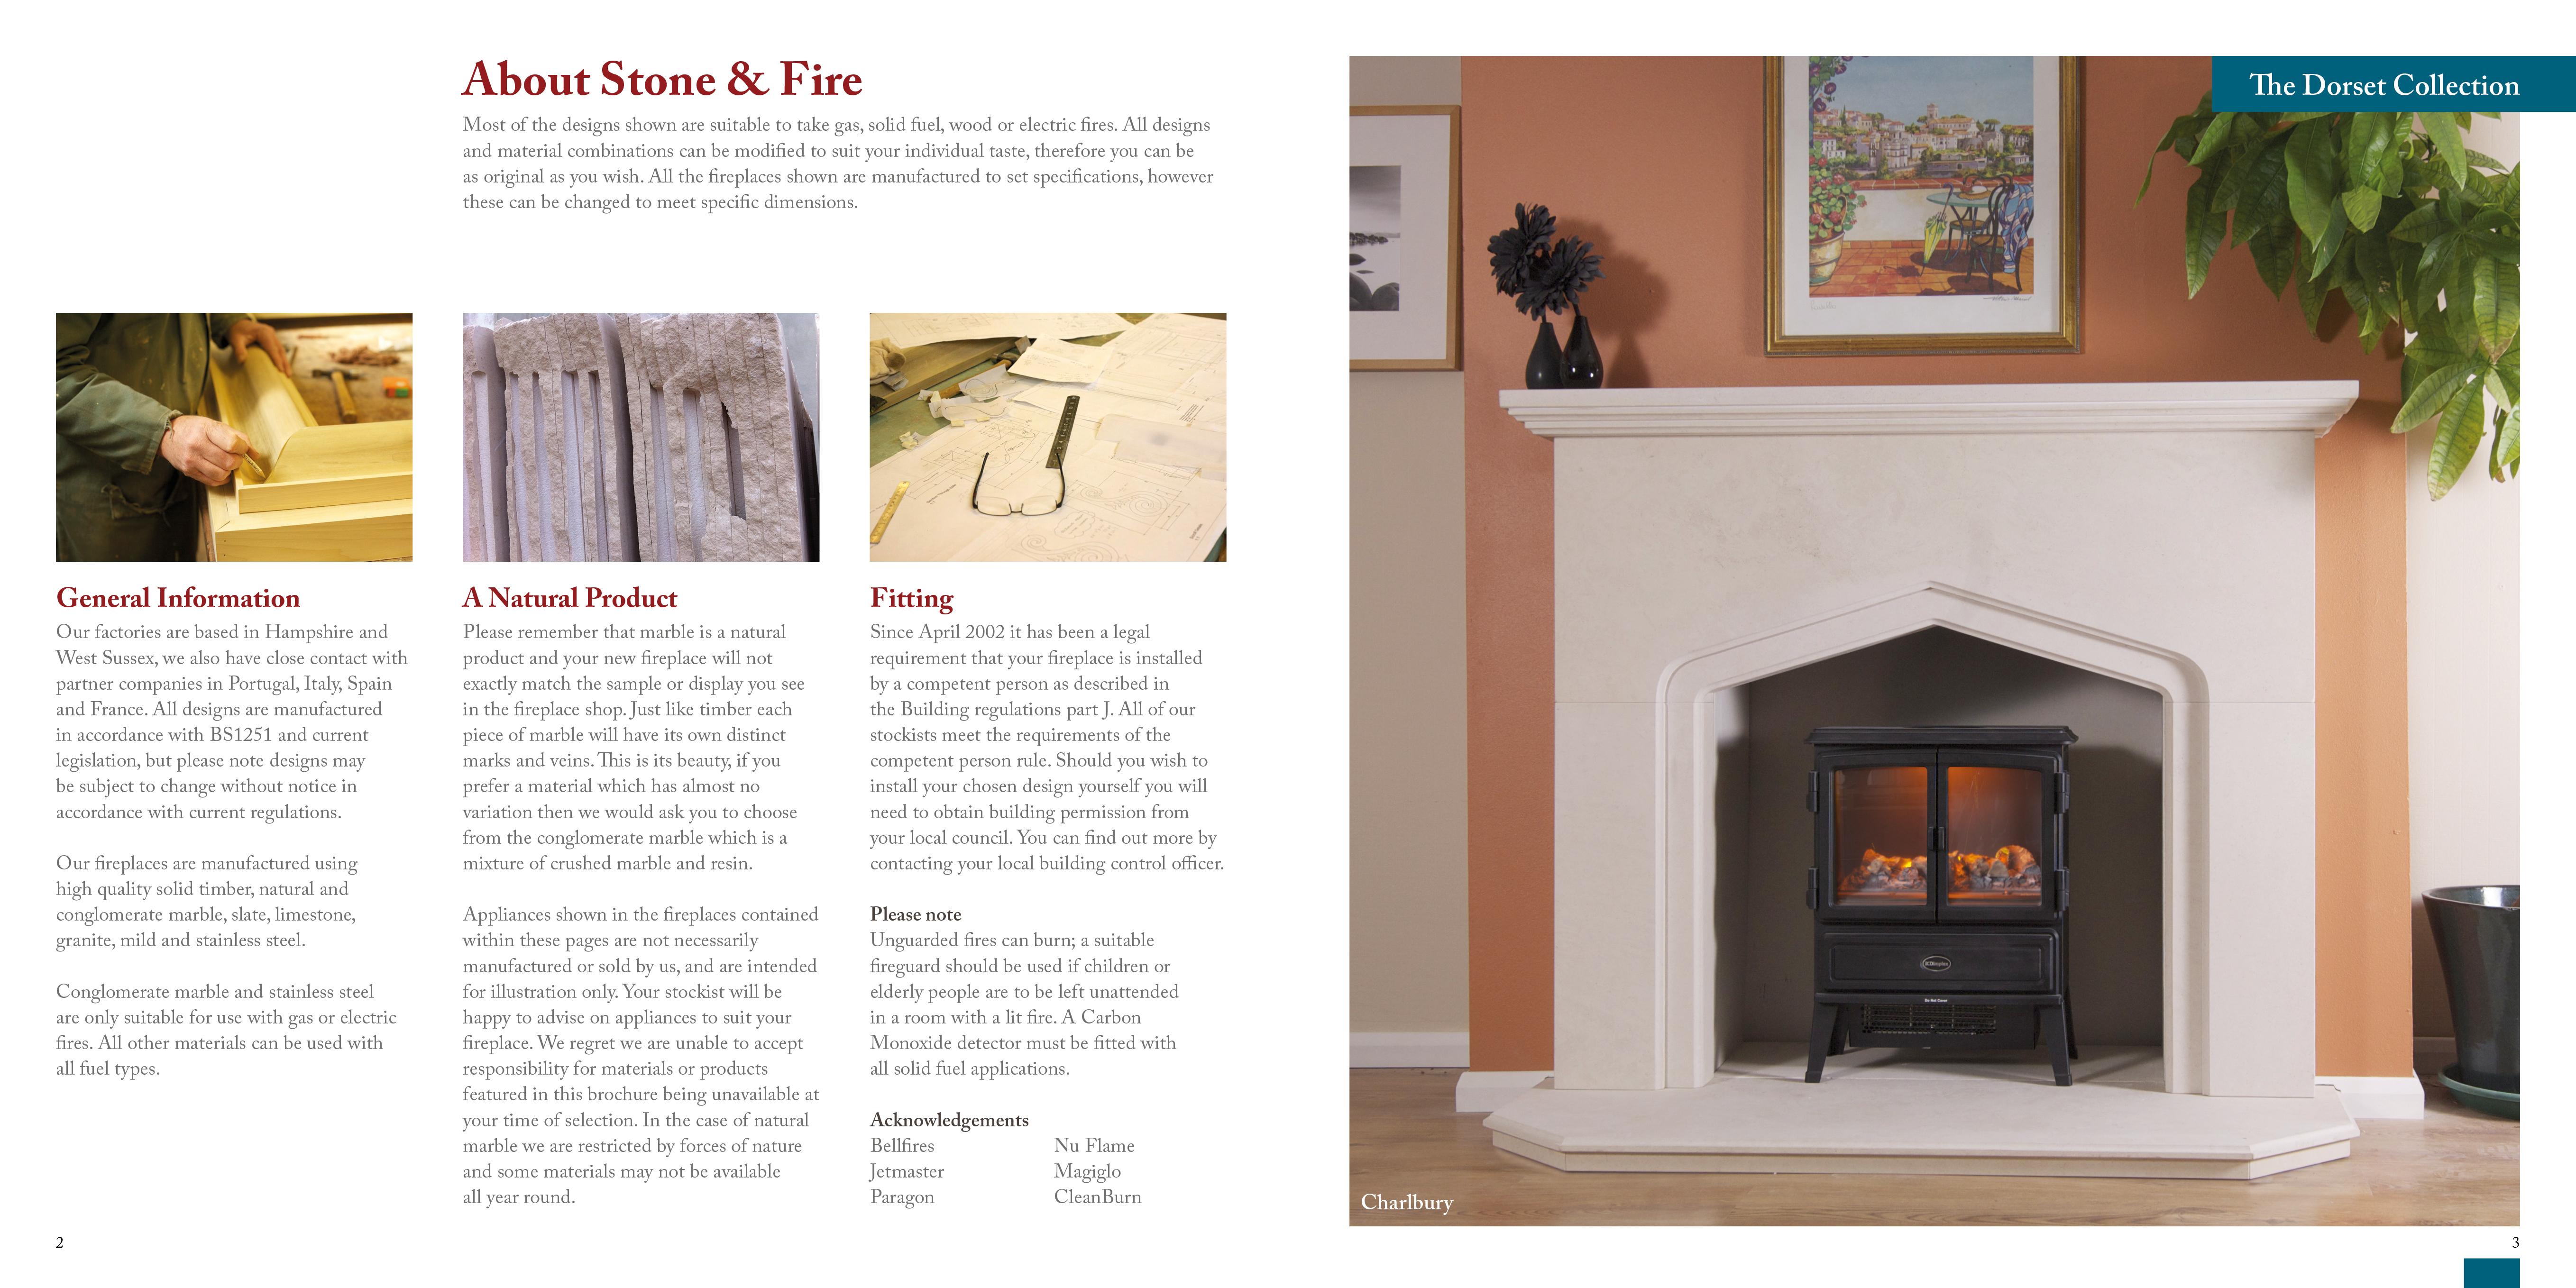 stoneandfire_brochure2014_2-3